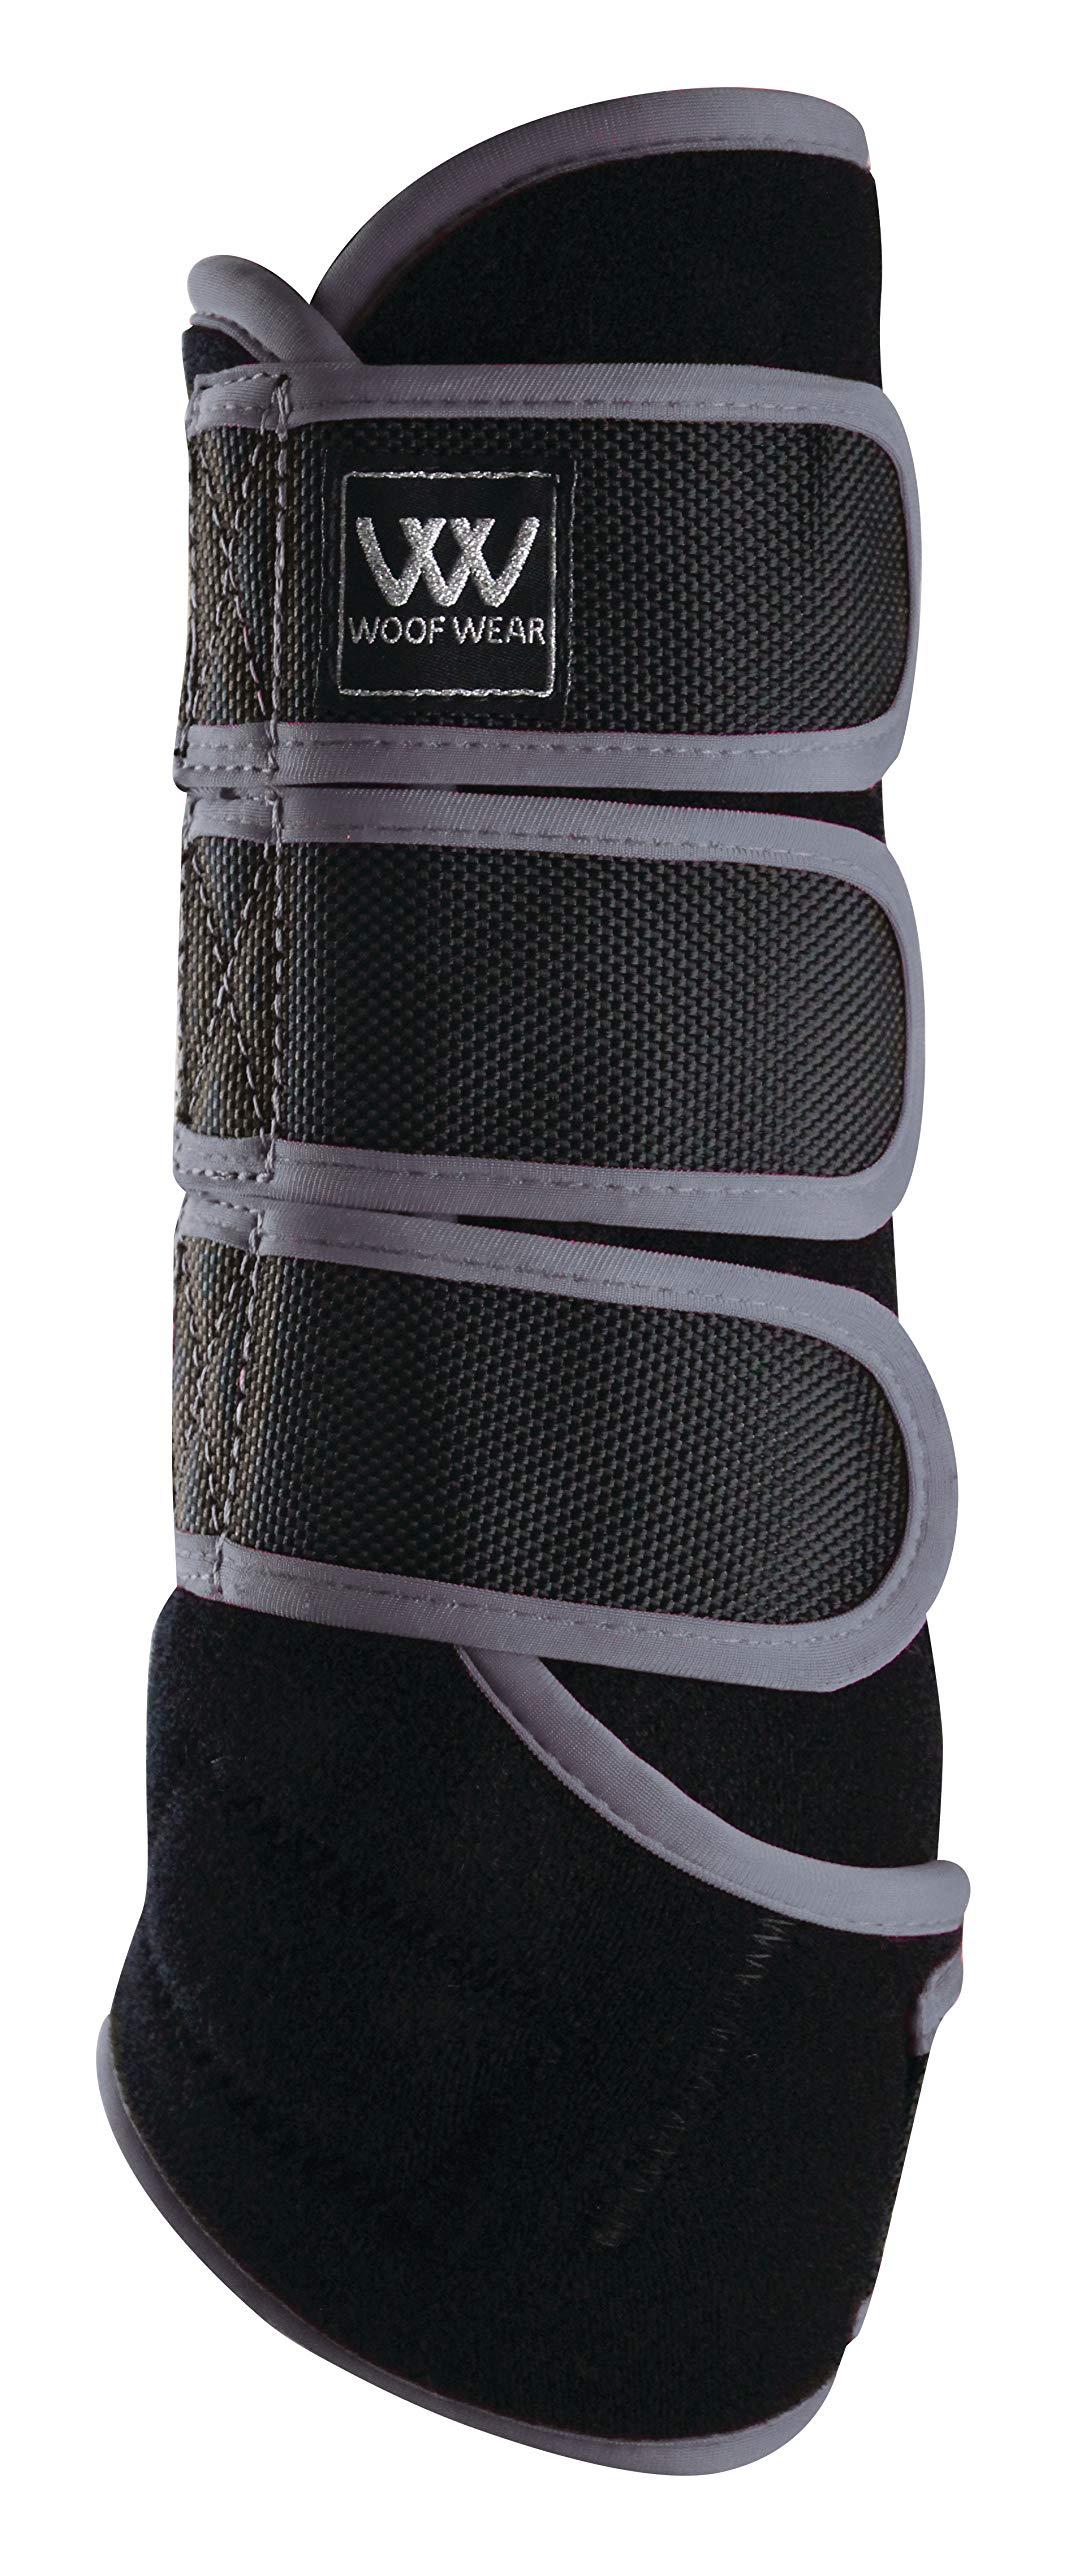 WOOF WEAR Dressage Exercise Wrap Medium Black Brushed Steel